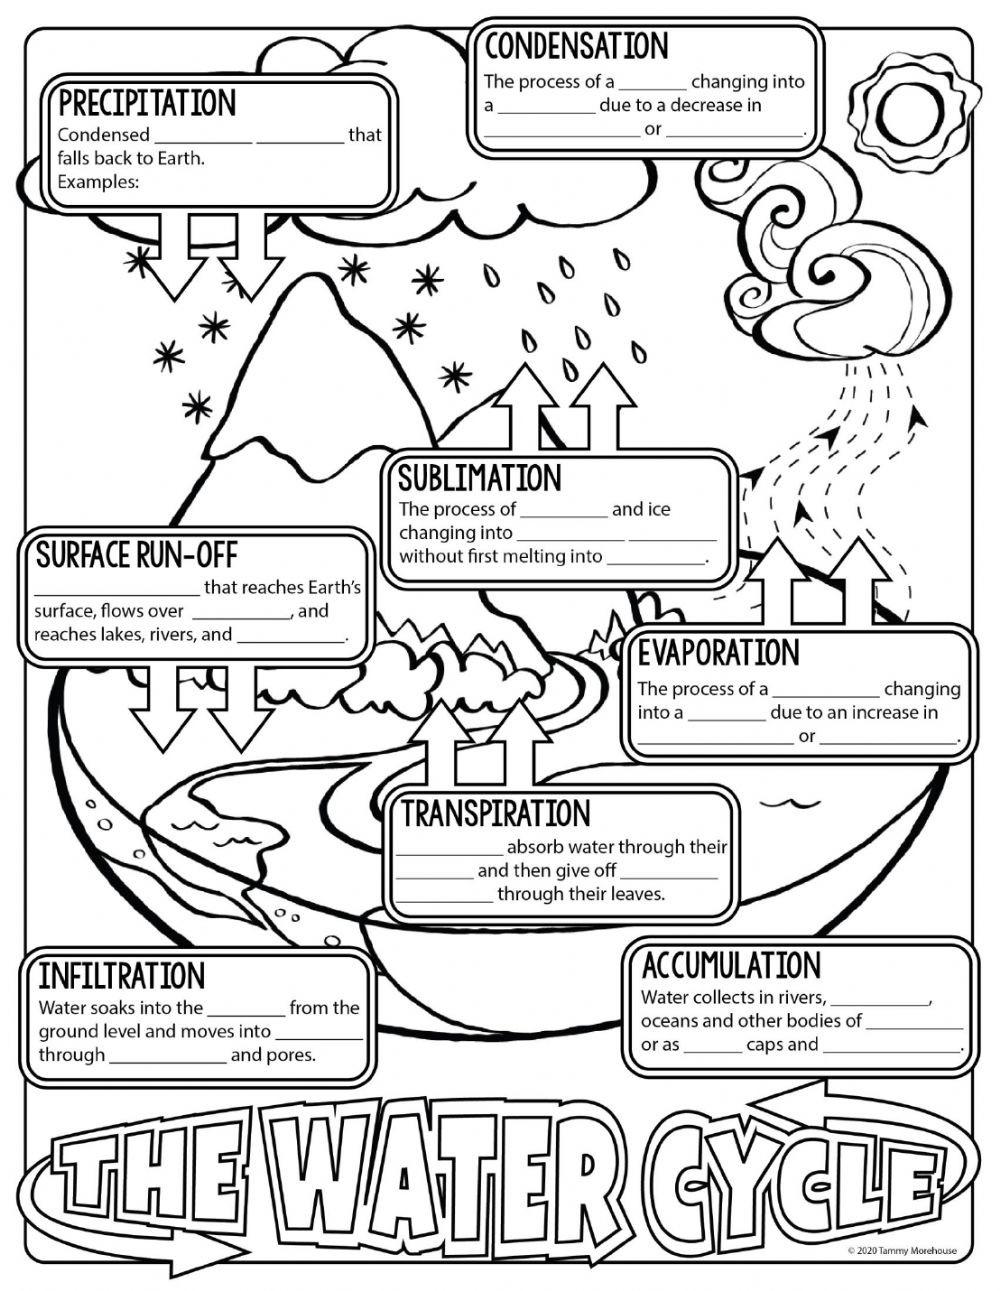 Rock Cycle Diagram Worksheet the Water Cycle Notes Interactive Worksheet